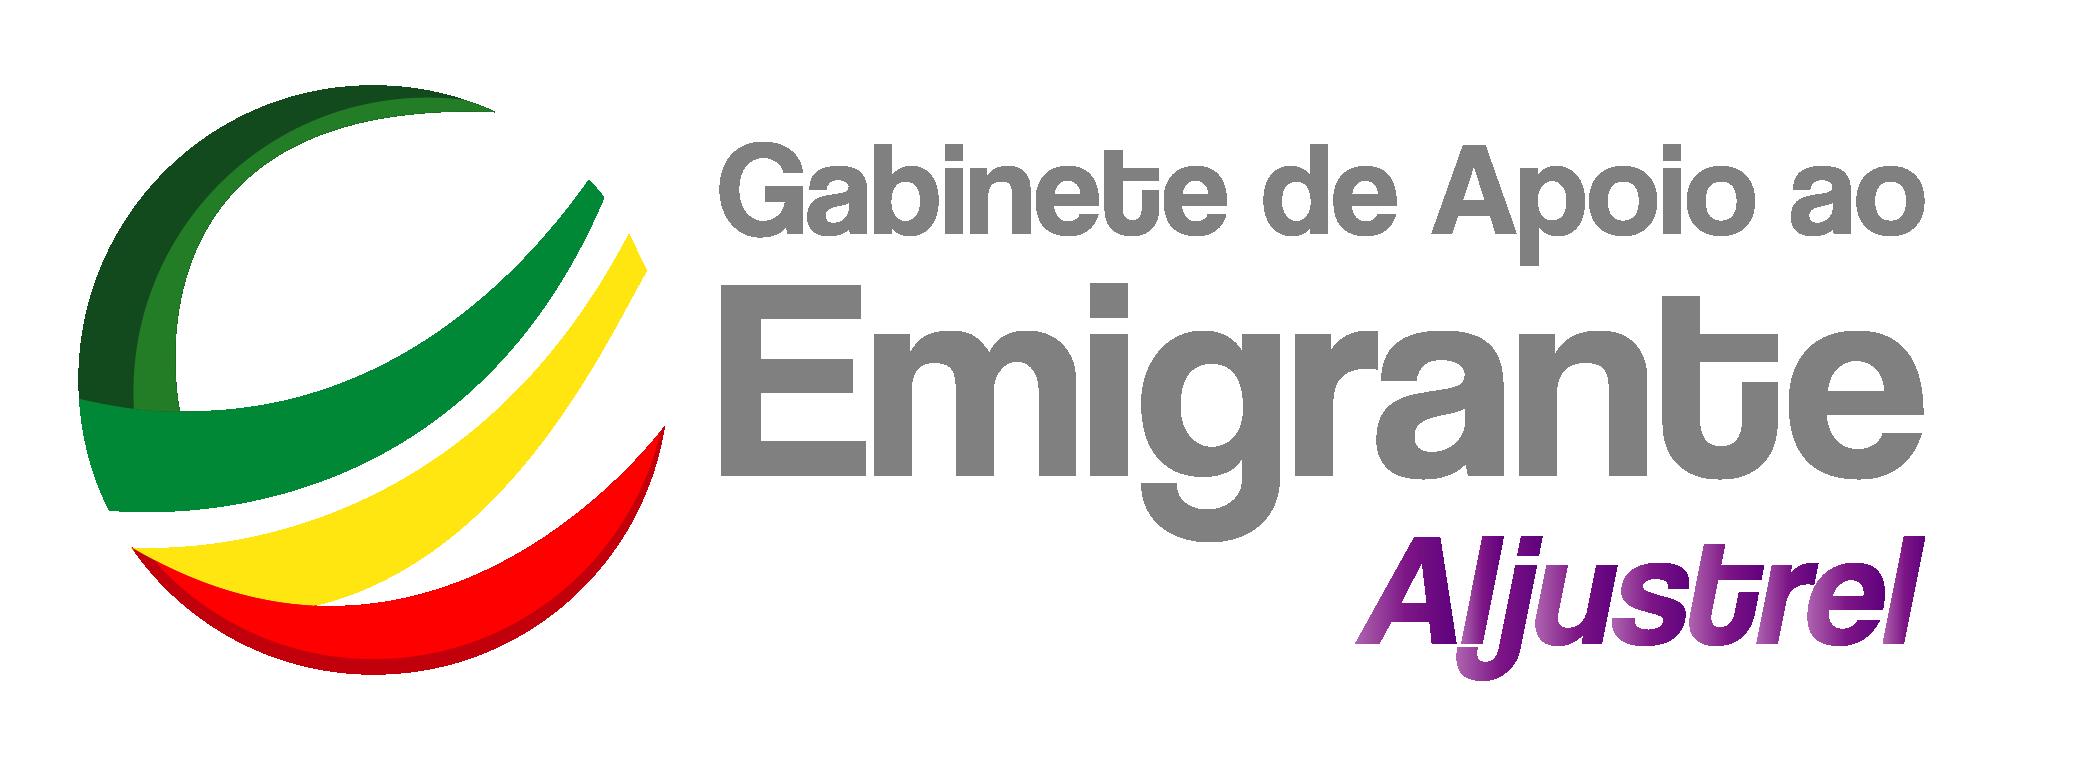 Gabinete Apoio ao Emigrante